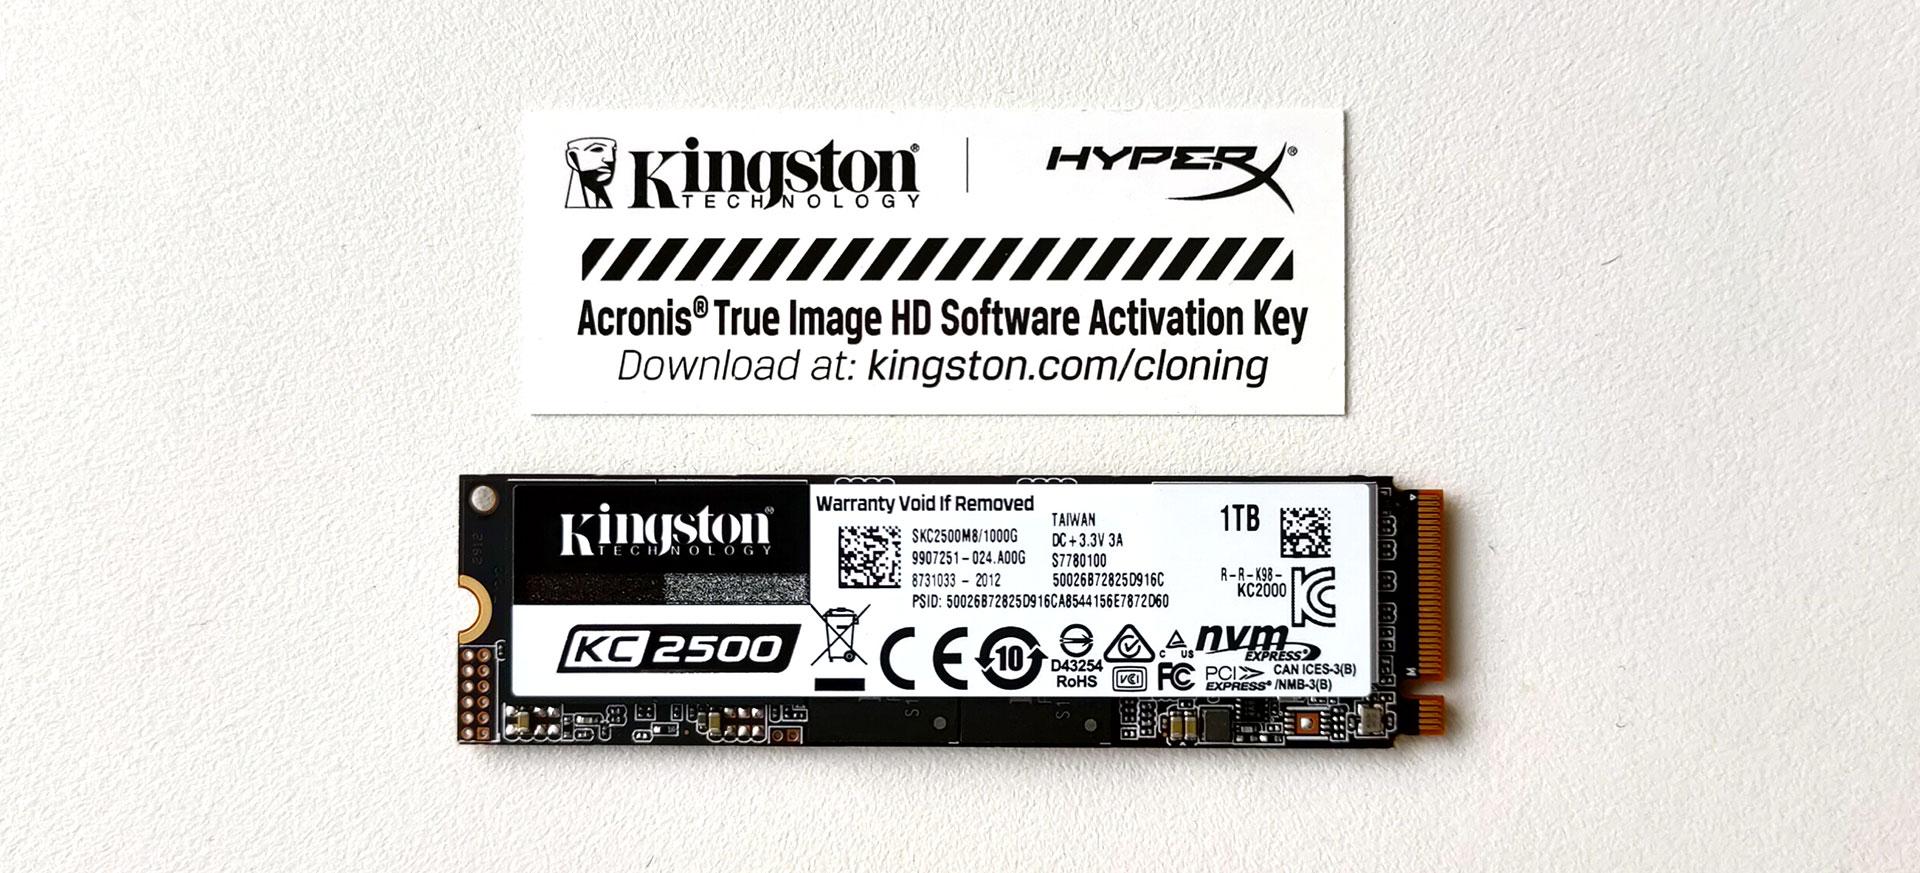 Kingston KC2500 1TB NVMe SSD uitgepakt